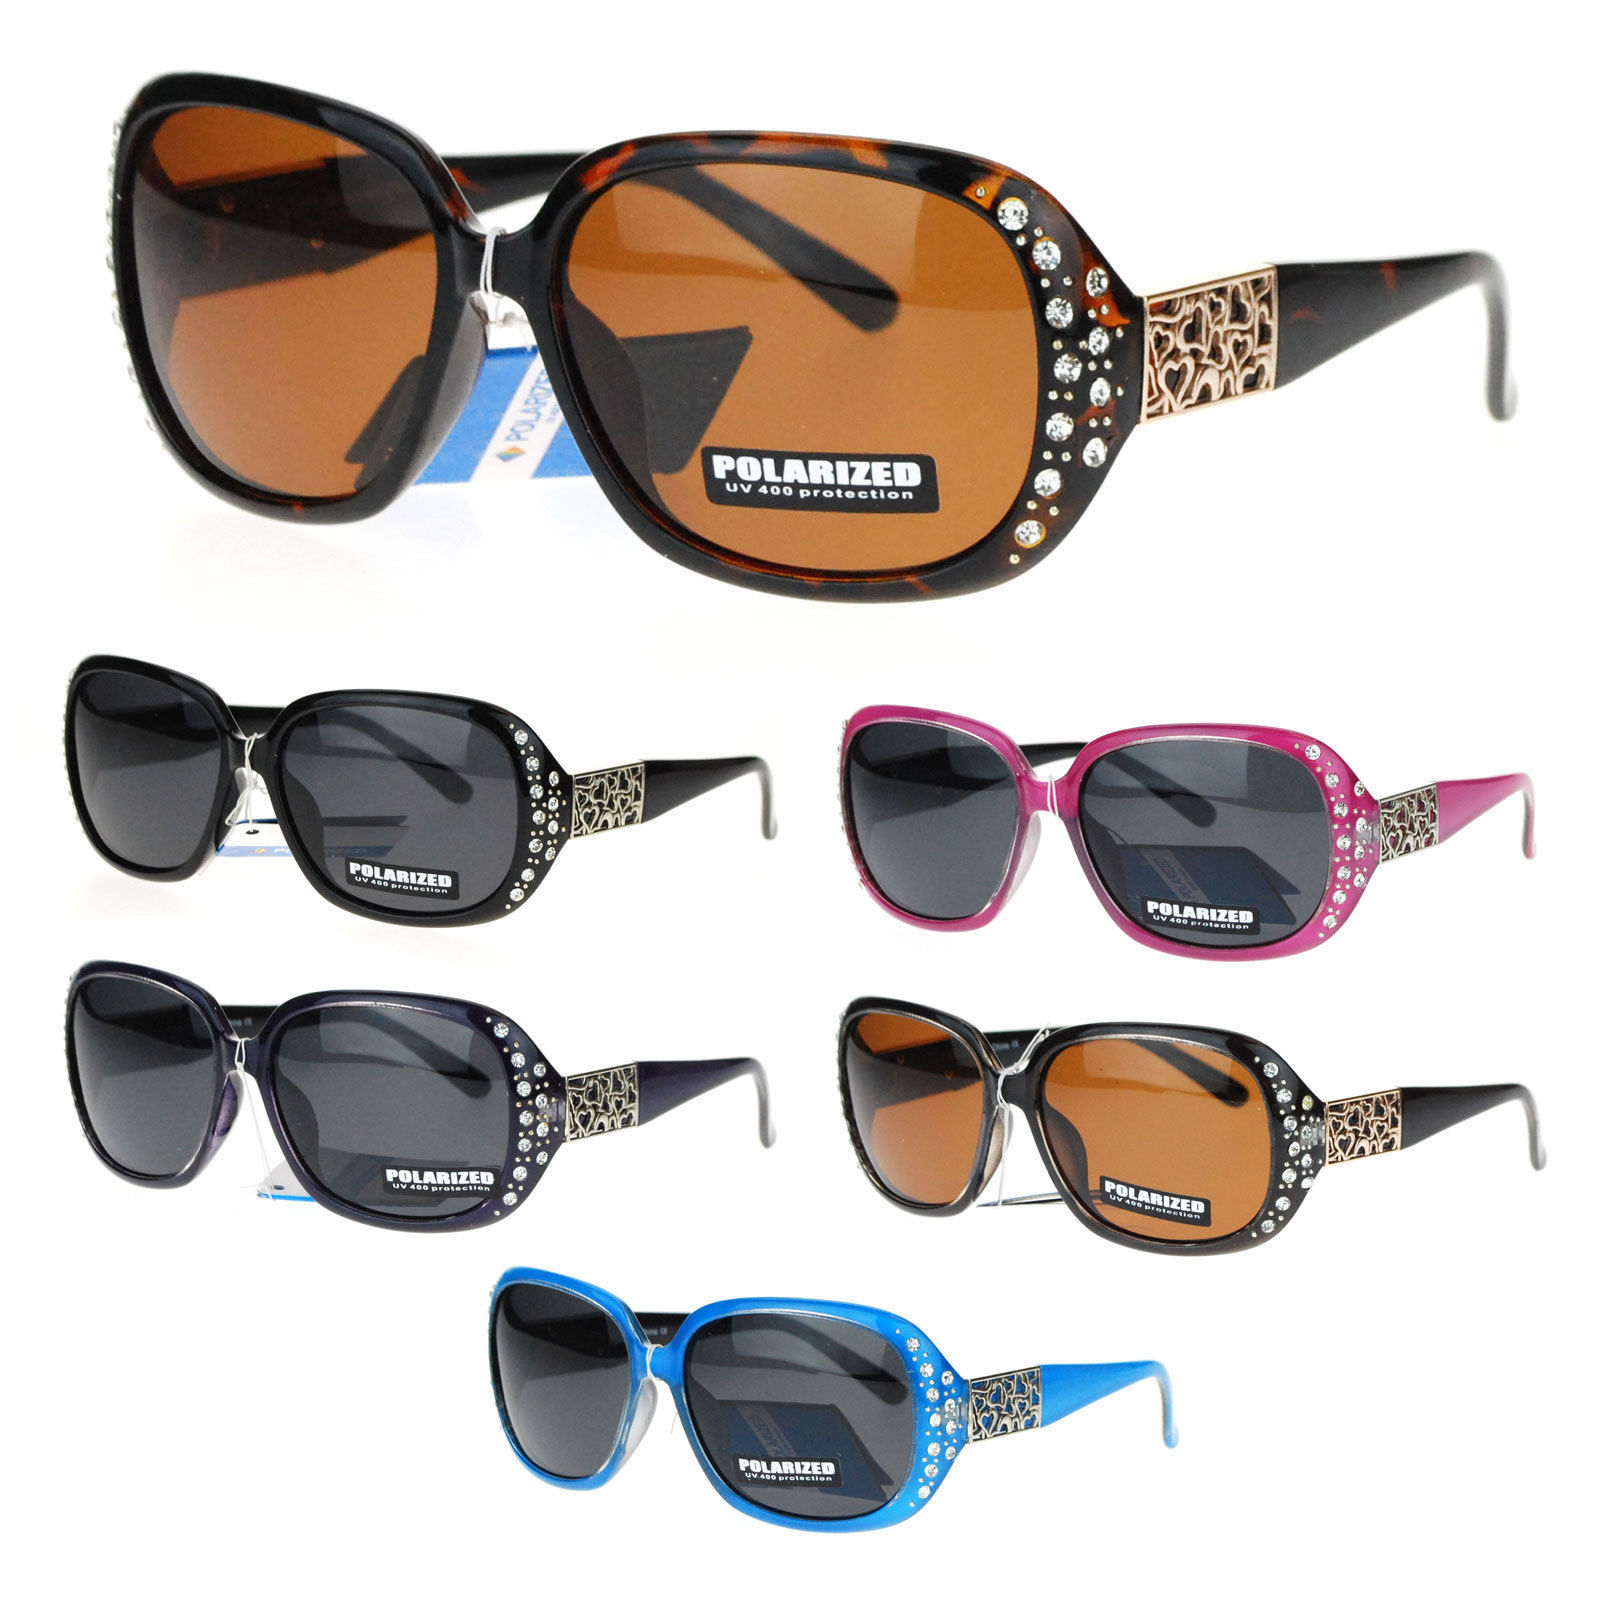 01cbd7a9954 Glare Polarized Sunglasses